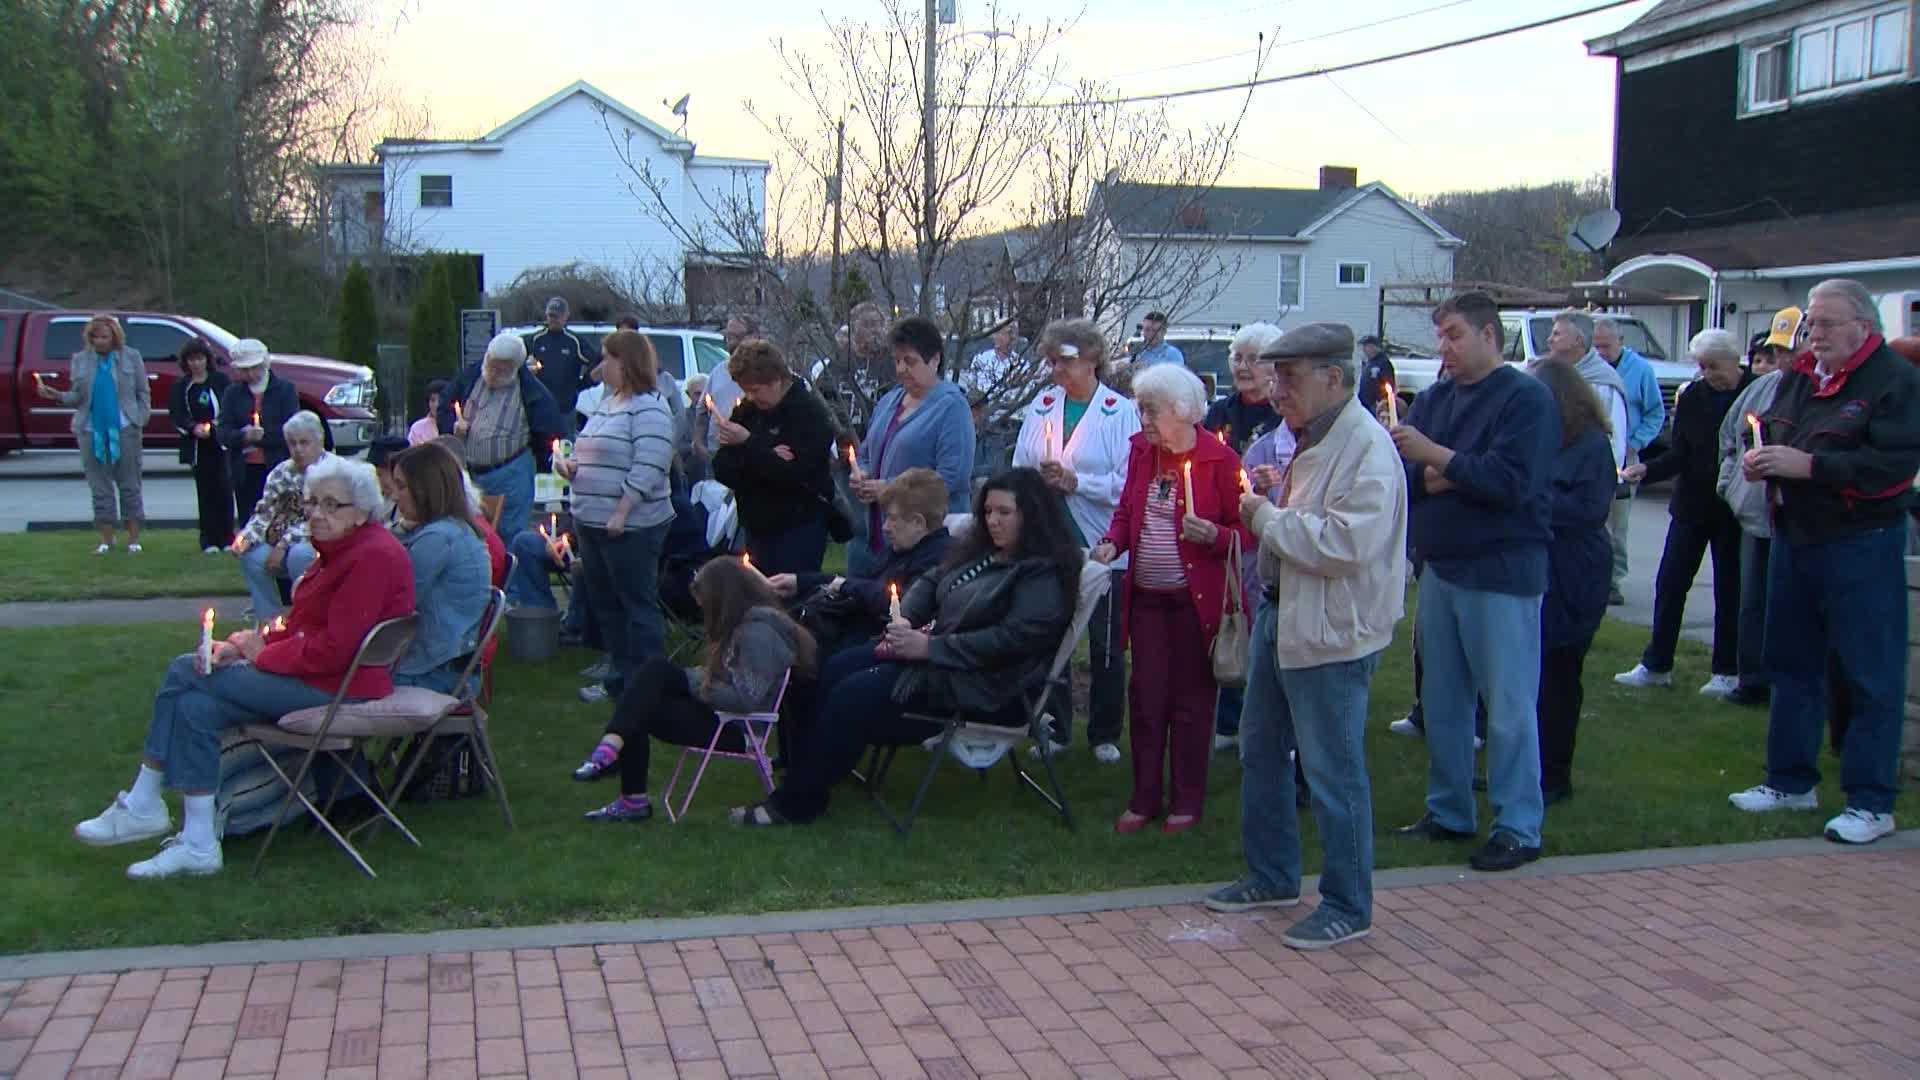 Parishioners protest closing of church